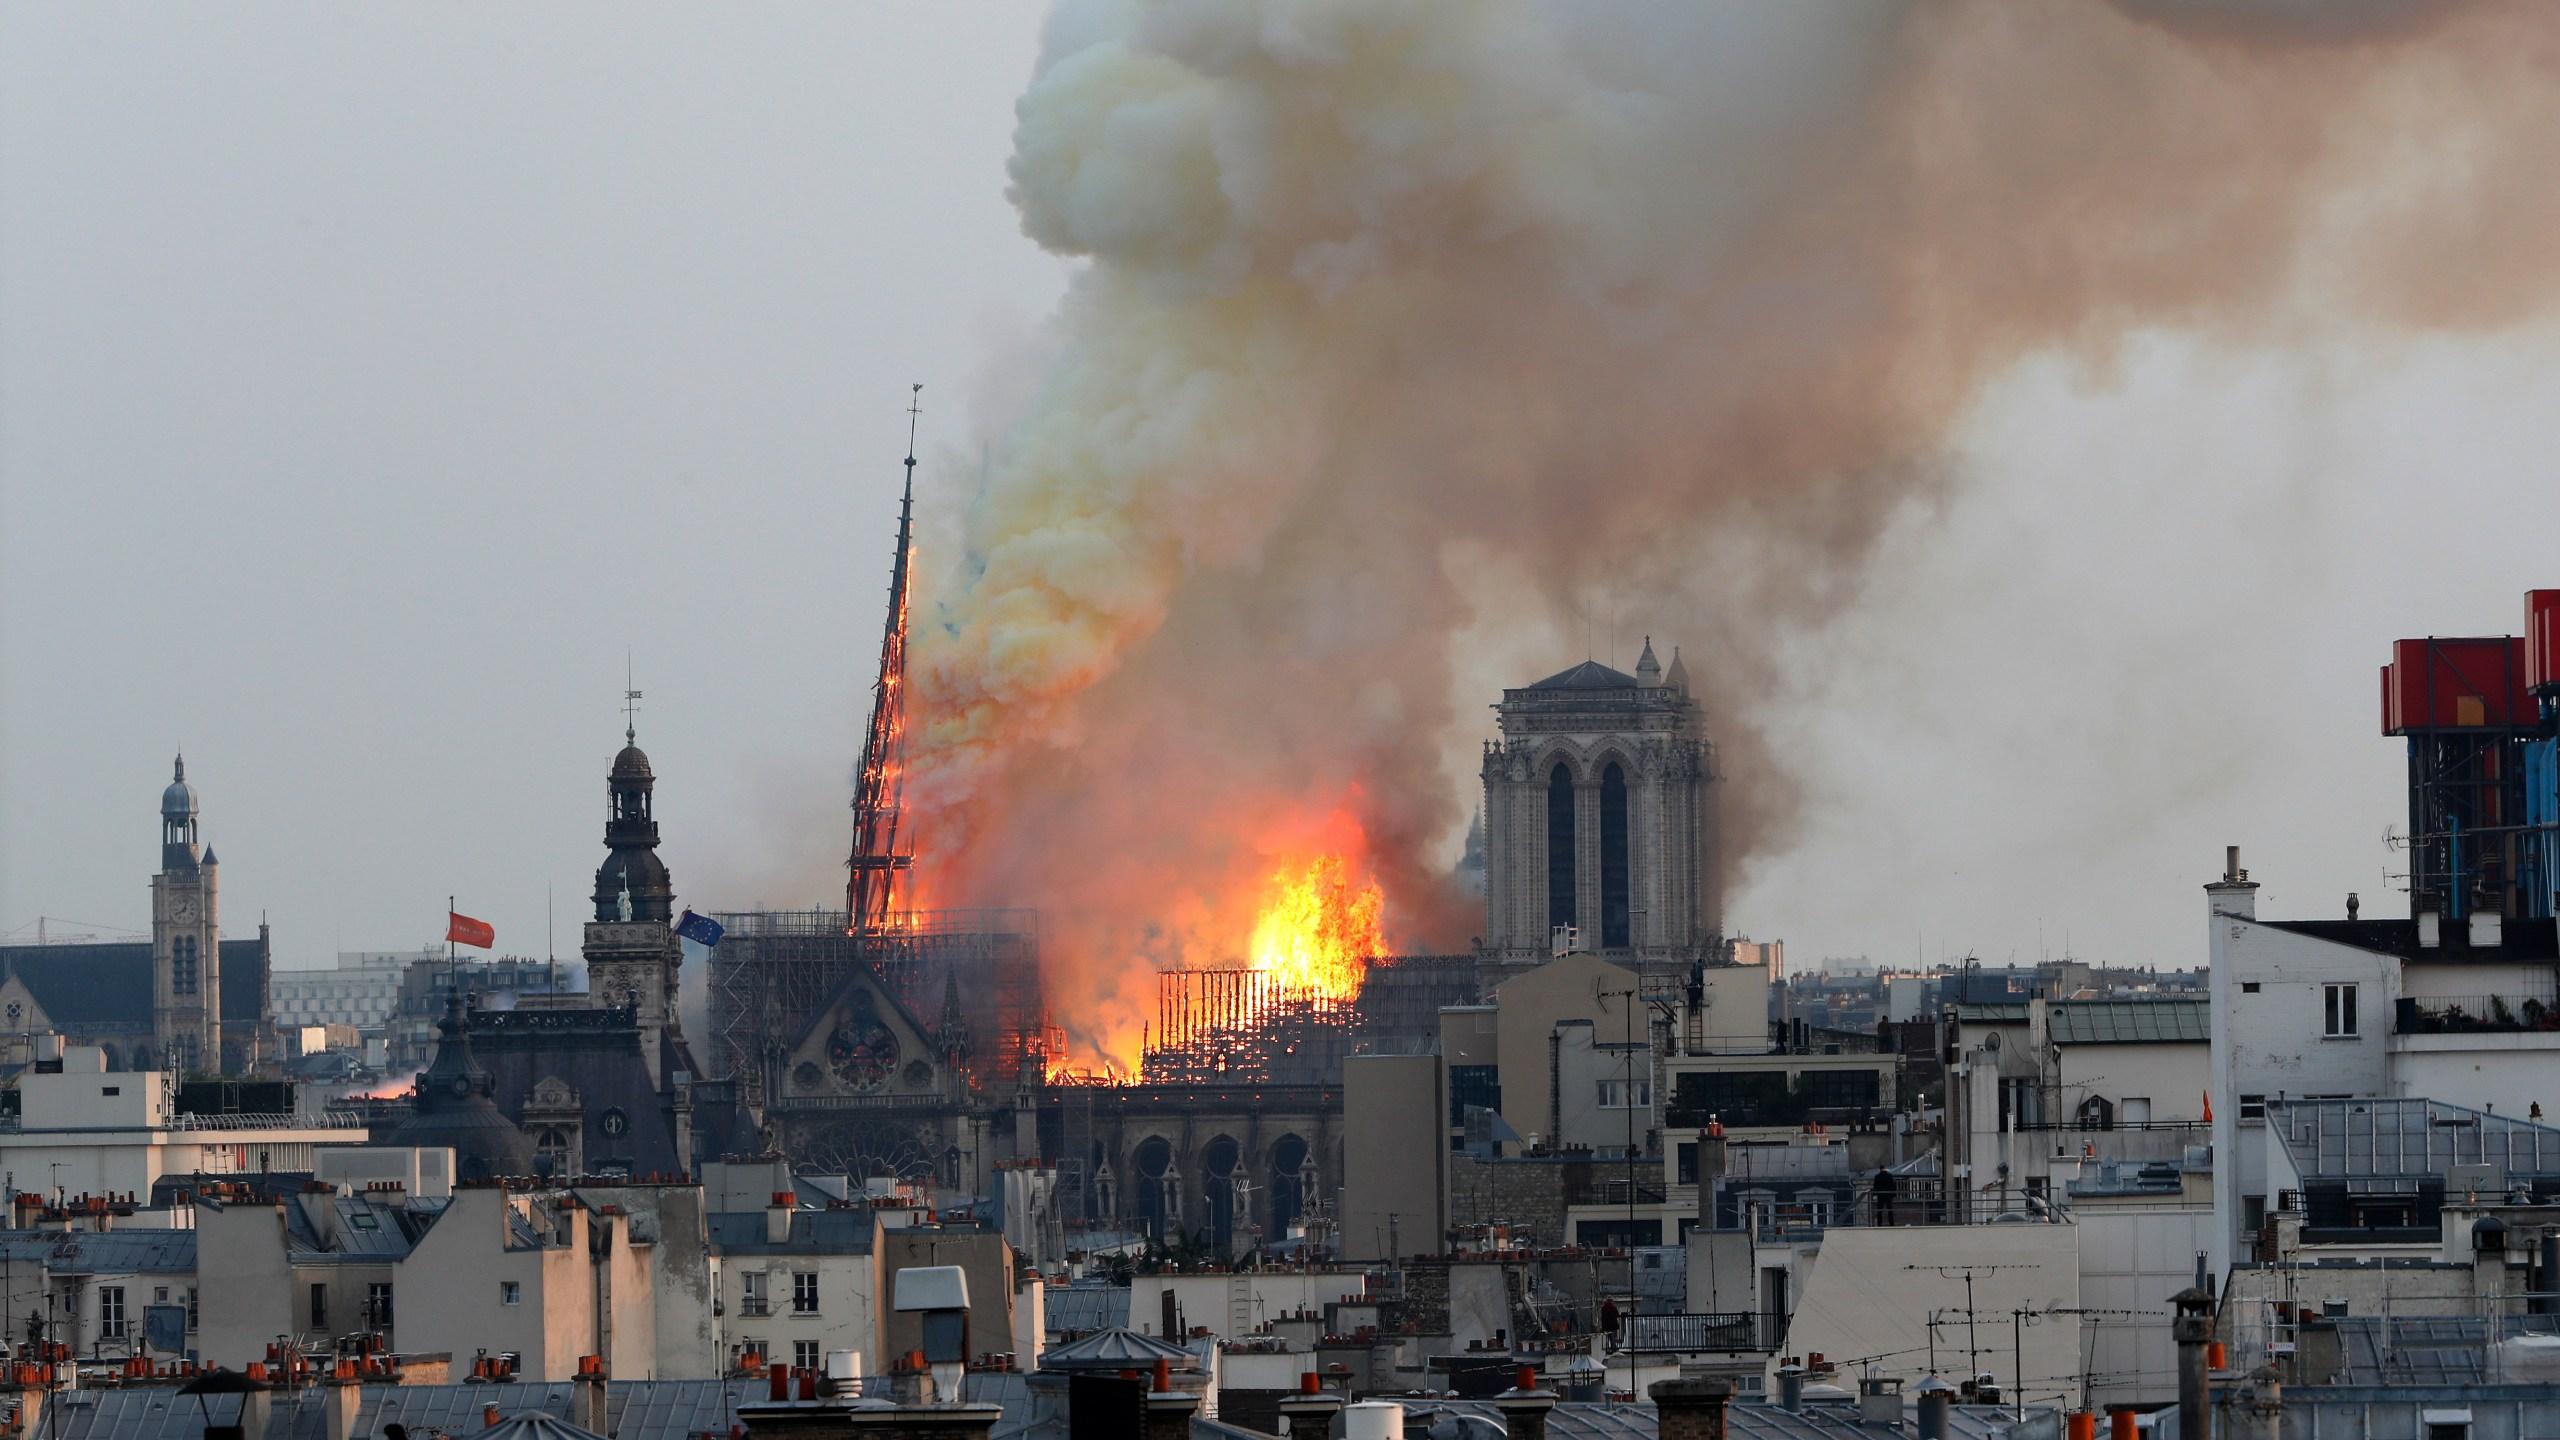 France_Notre_Dame_Fire_46756-159532.jpg33062014